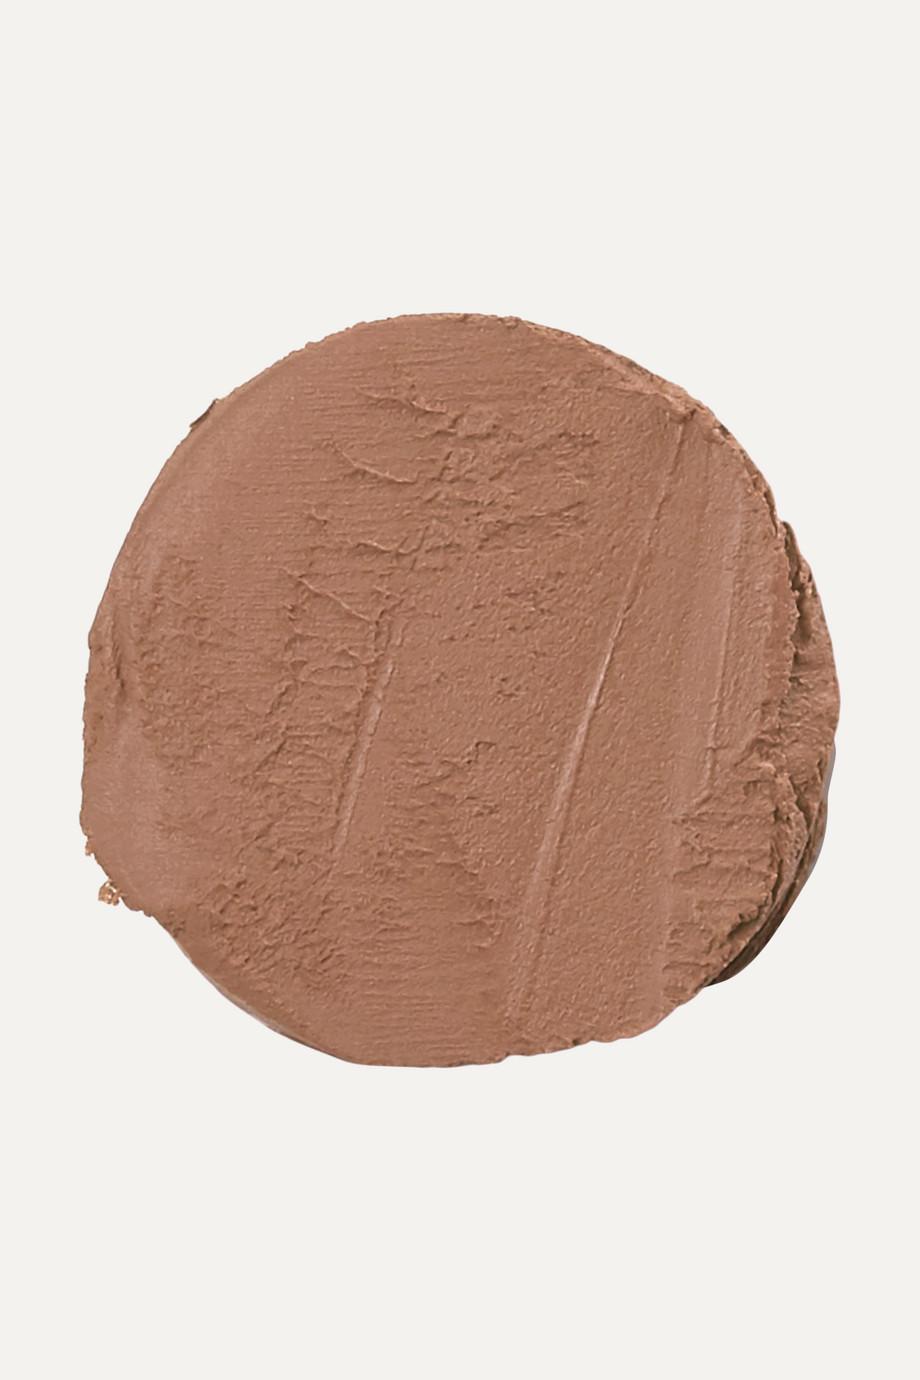 Huda Beauty Power Bullet Matte Lipstick - Staycation